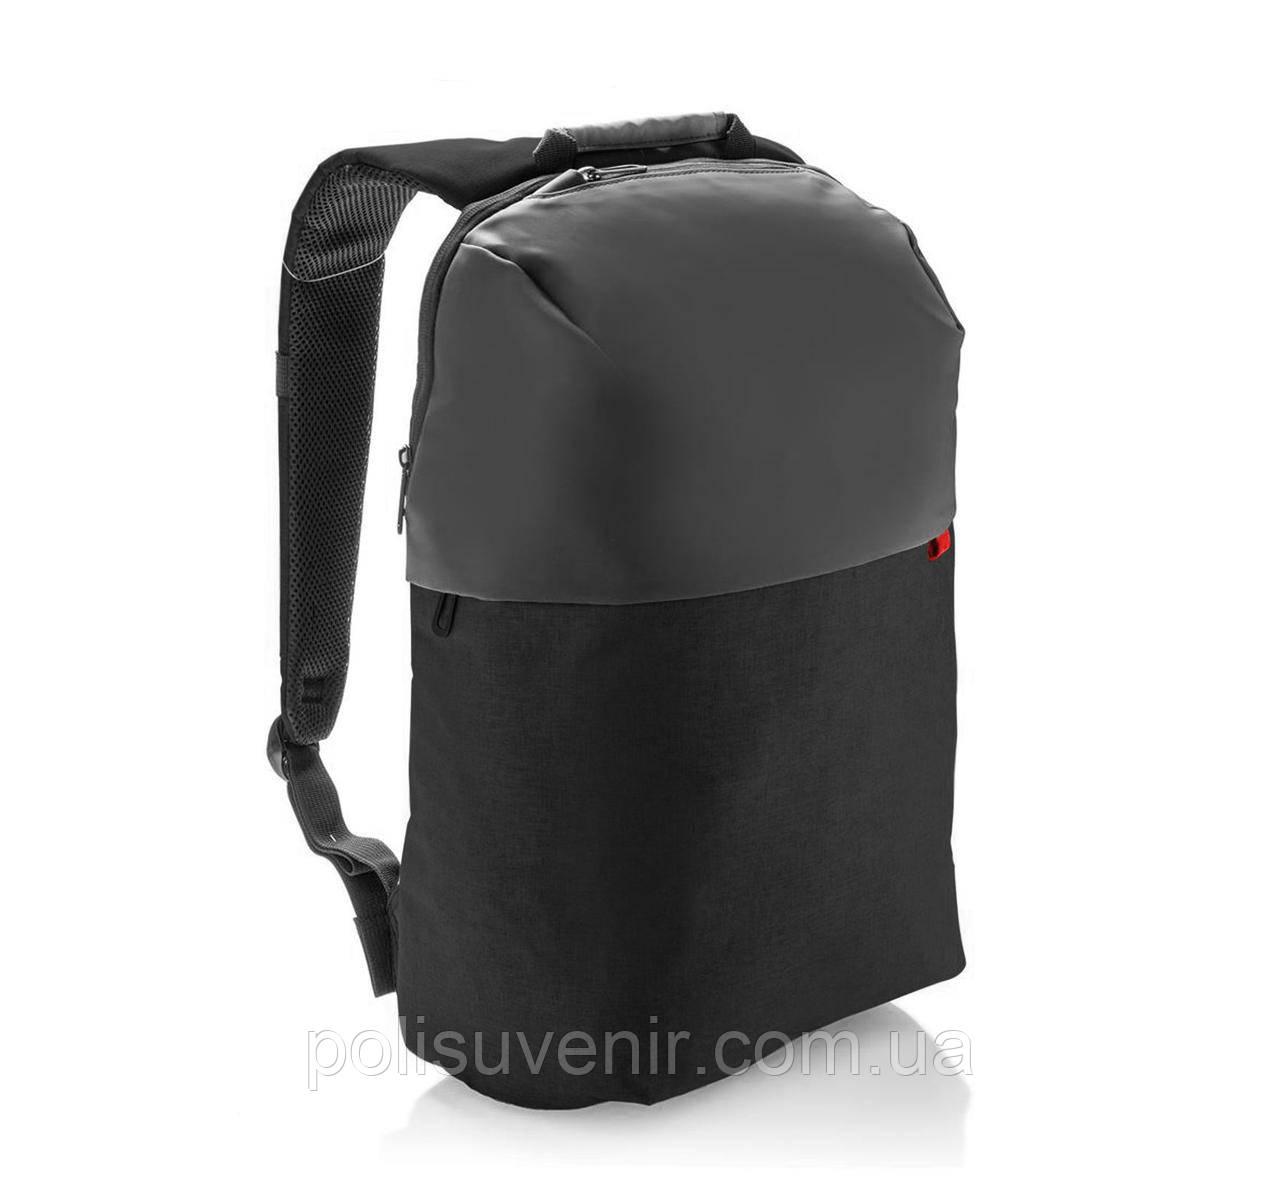 Рюкзак для ноутбука та планшету 15